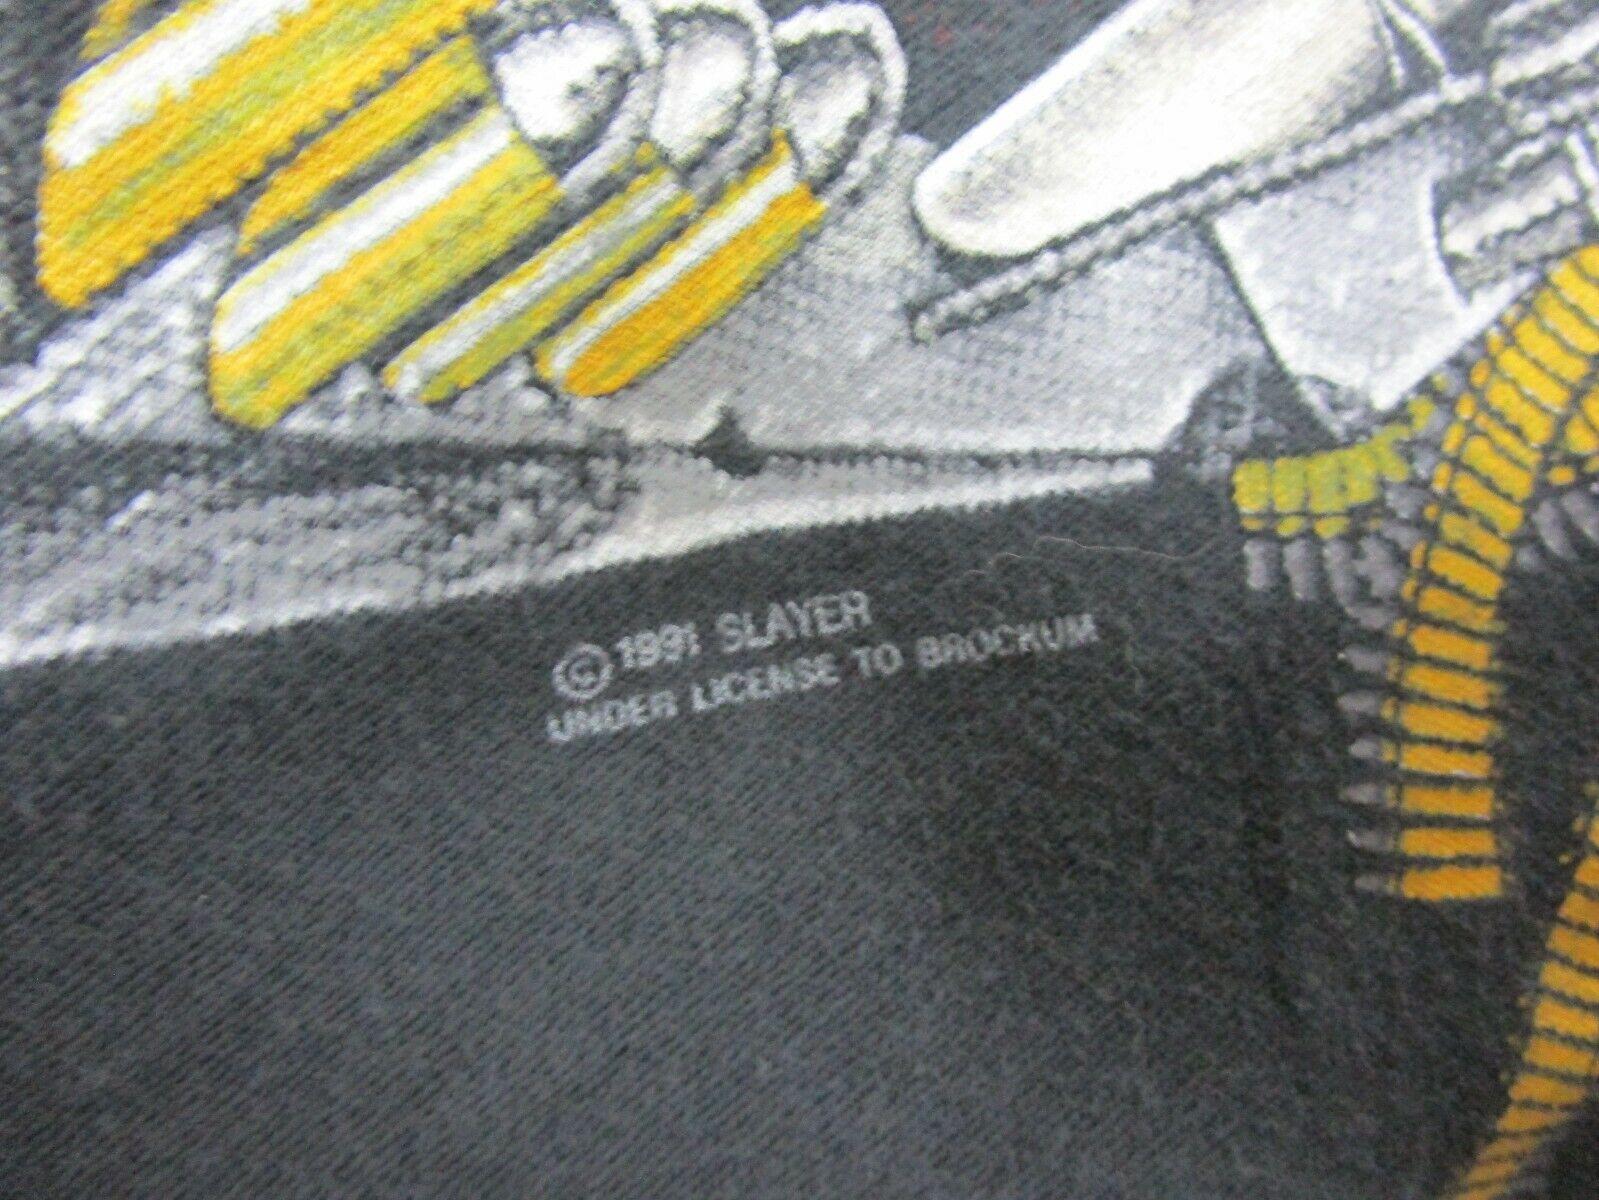 Vintage 1991 SLAYER CLASH OF THE TITANS T-SHIRT R… - image 4